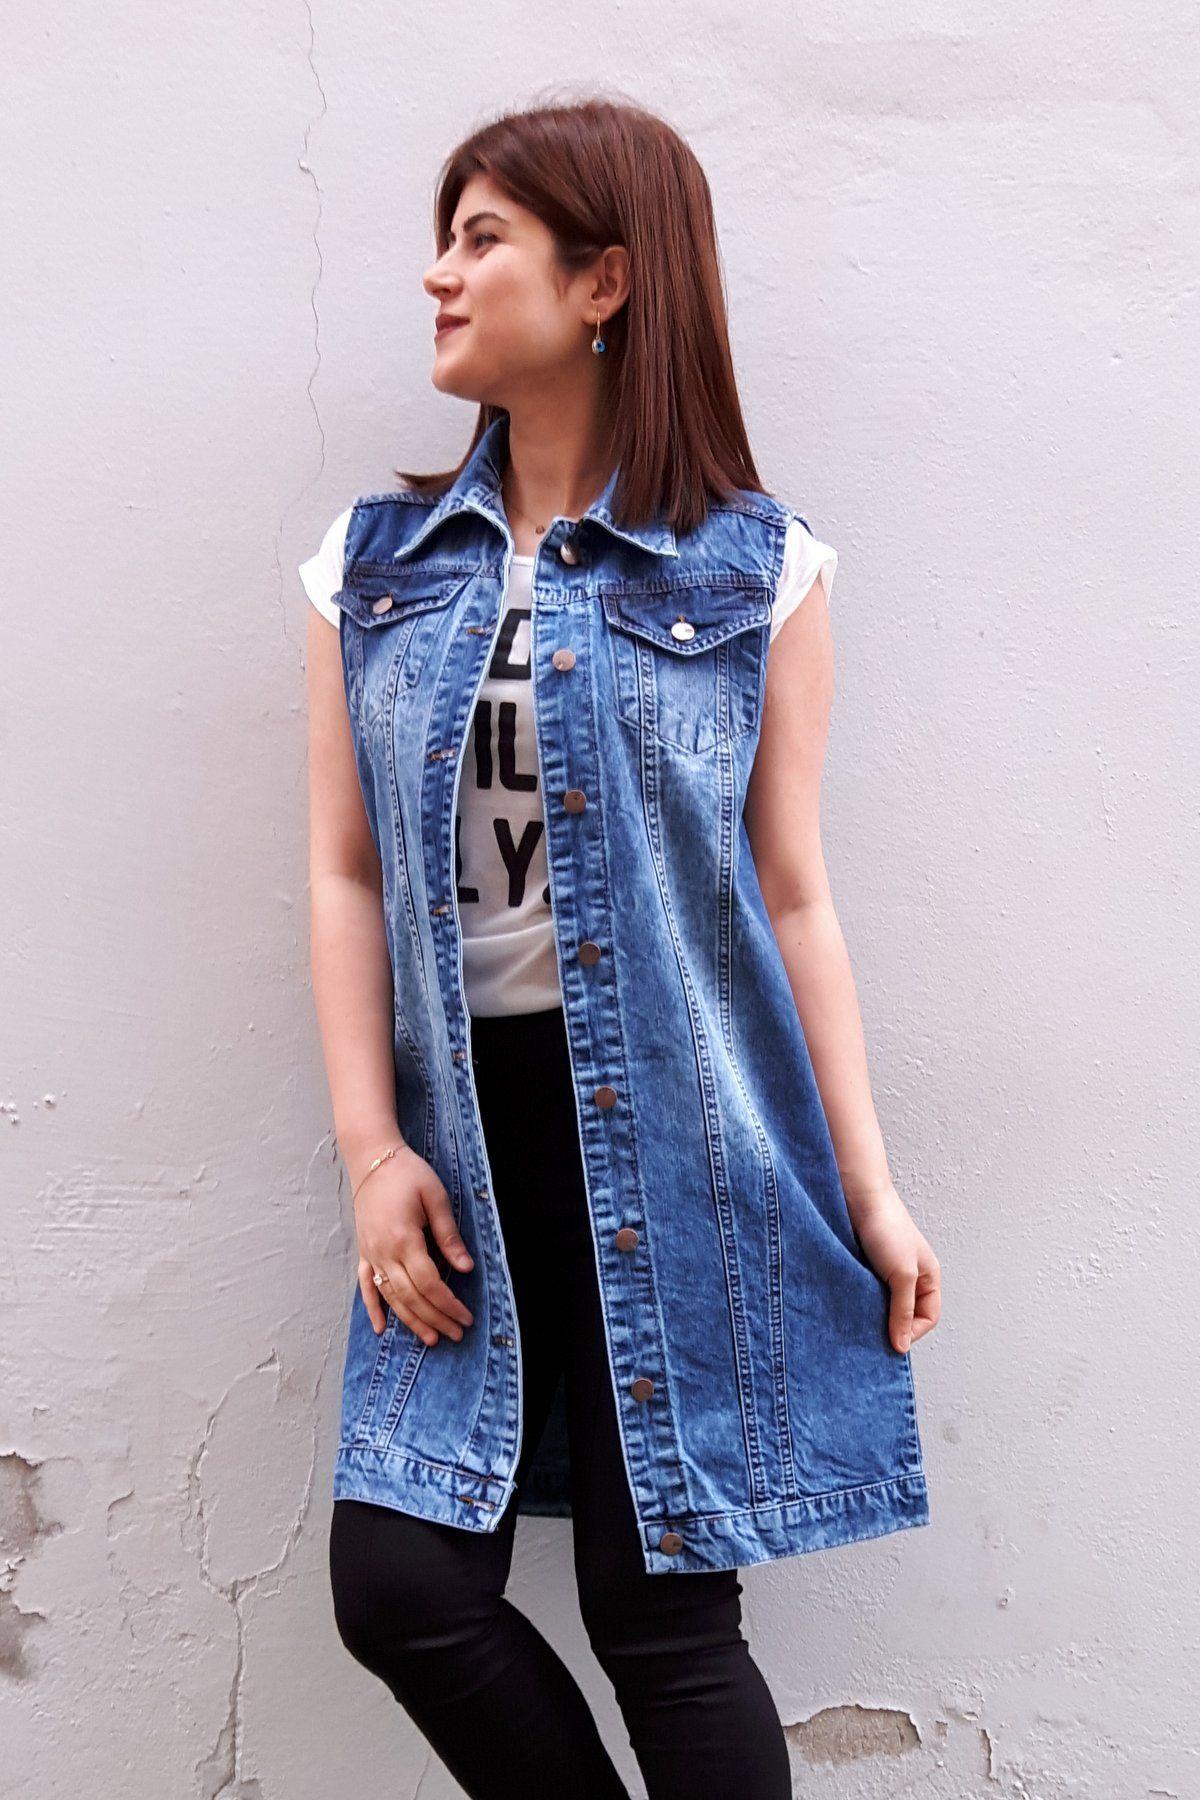 Yikamali Uzun Bayan Kot Yelek Moda Stilleri Giyim Kot Yelek